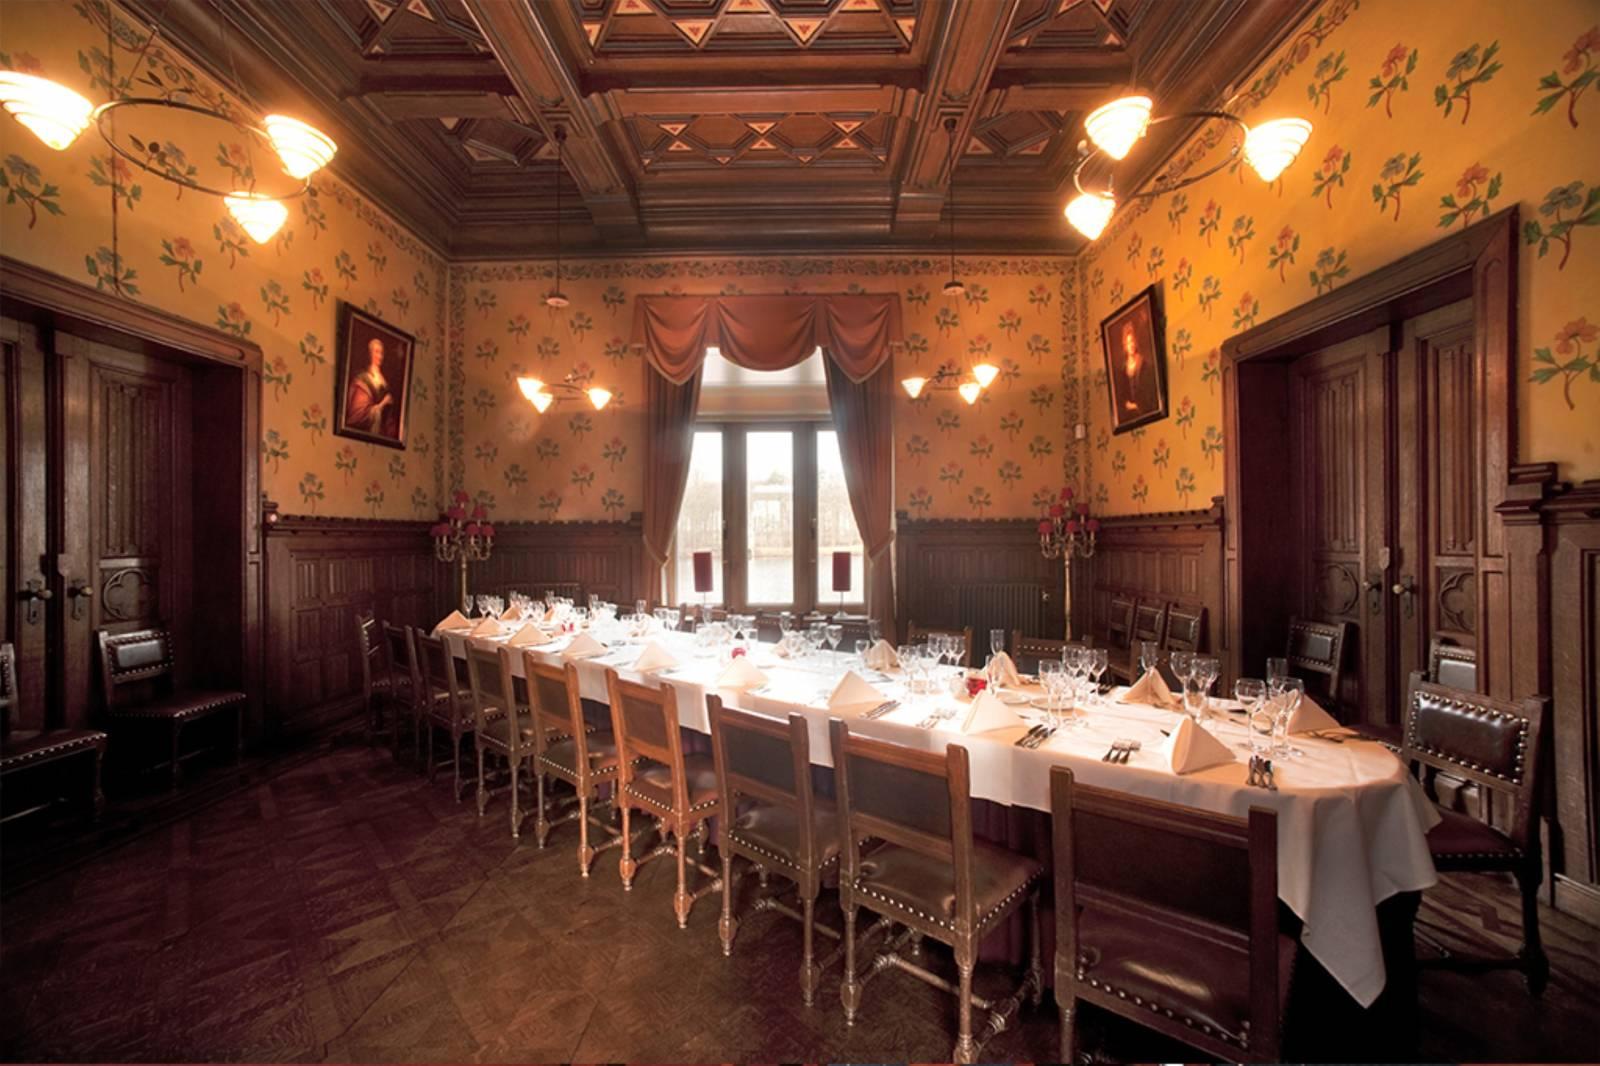 Kasteel D'artrycke - Feestzaal - House of Weddings (18)